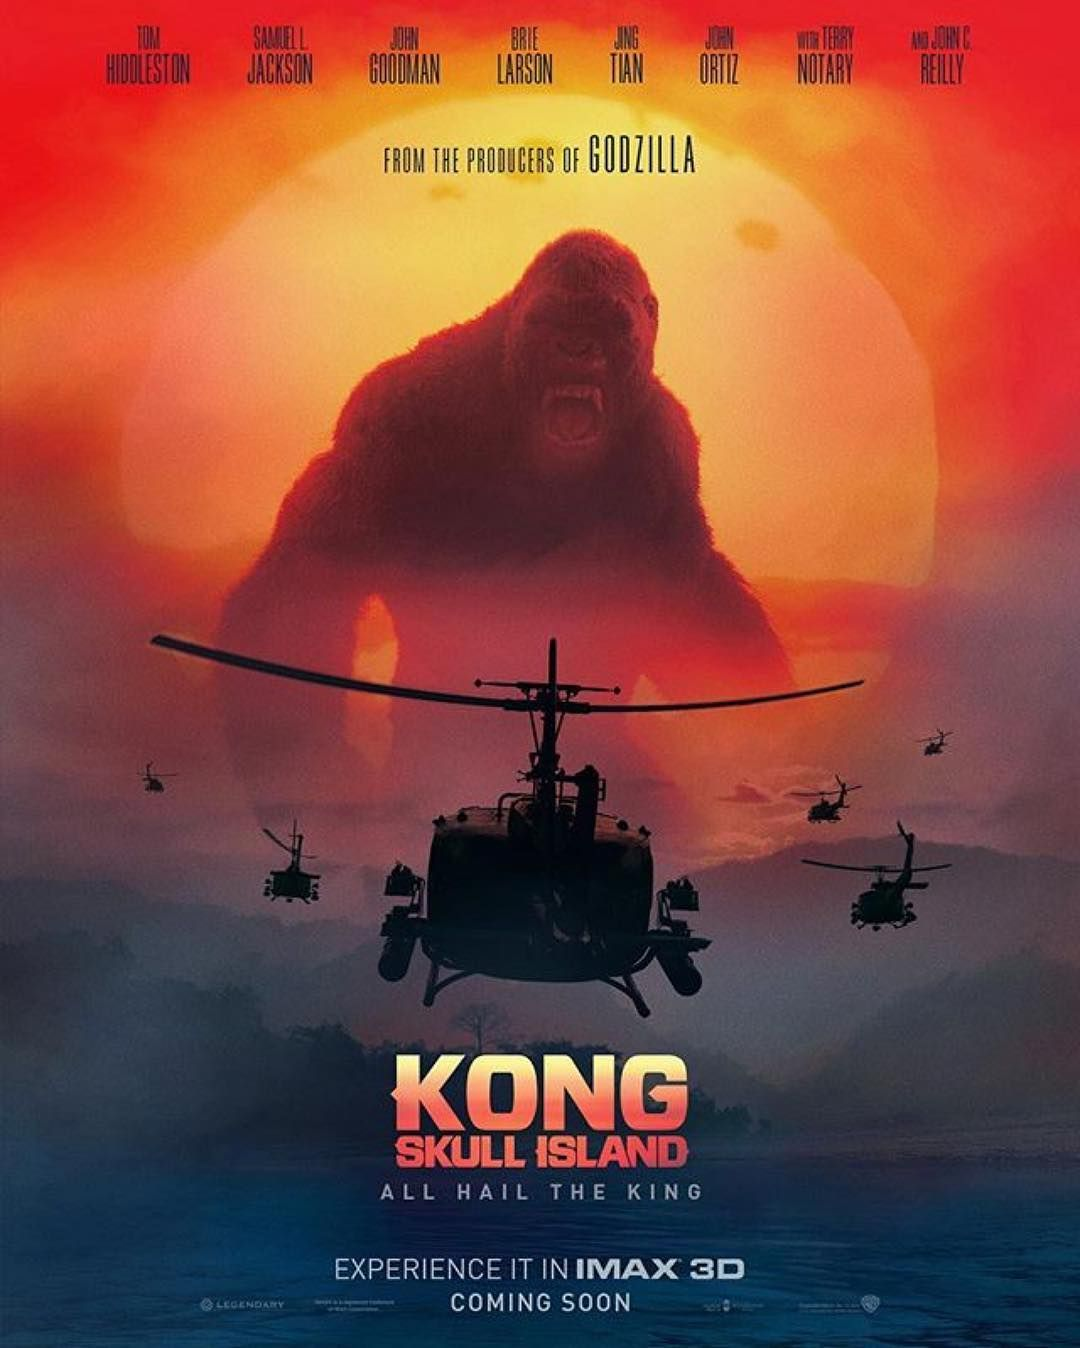 Pin by Deym on Moviekong skull misland Island movies